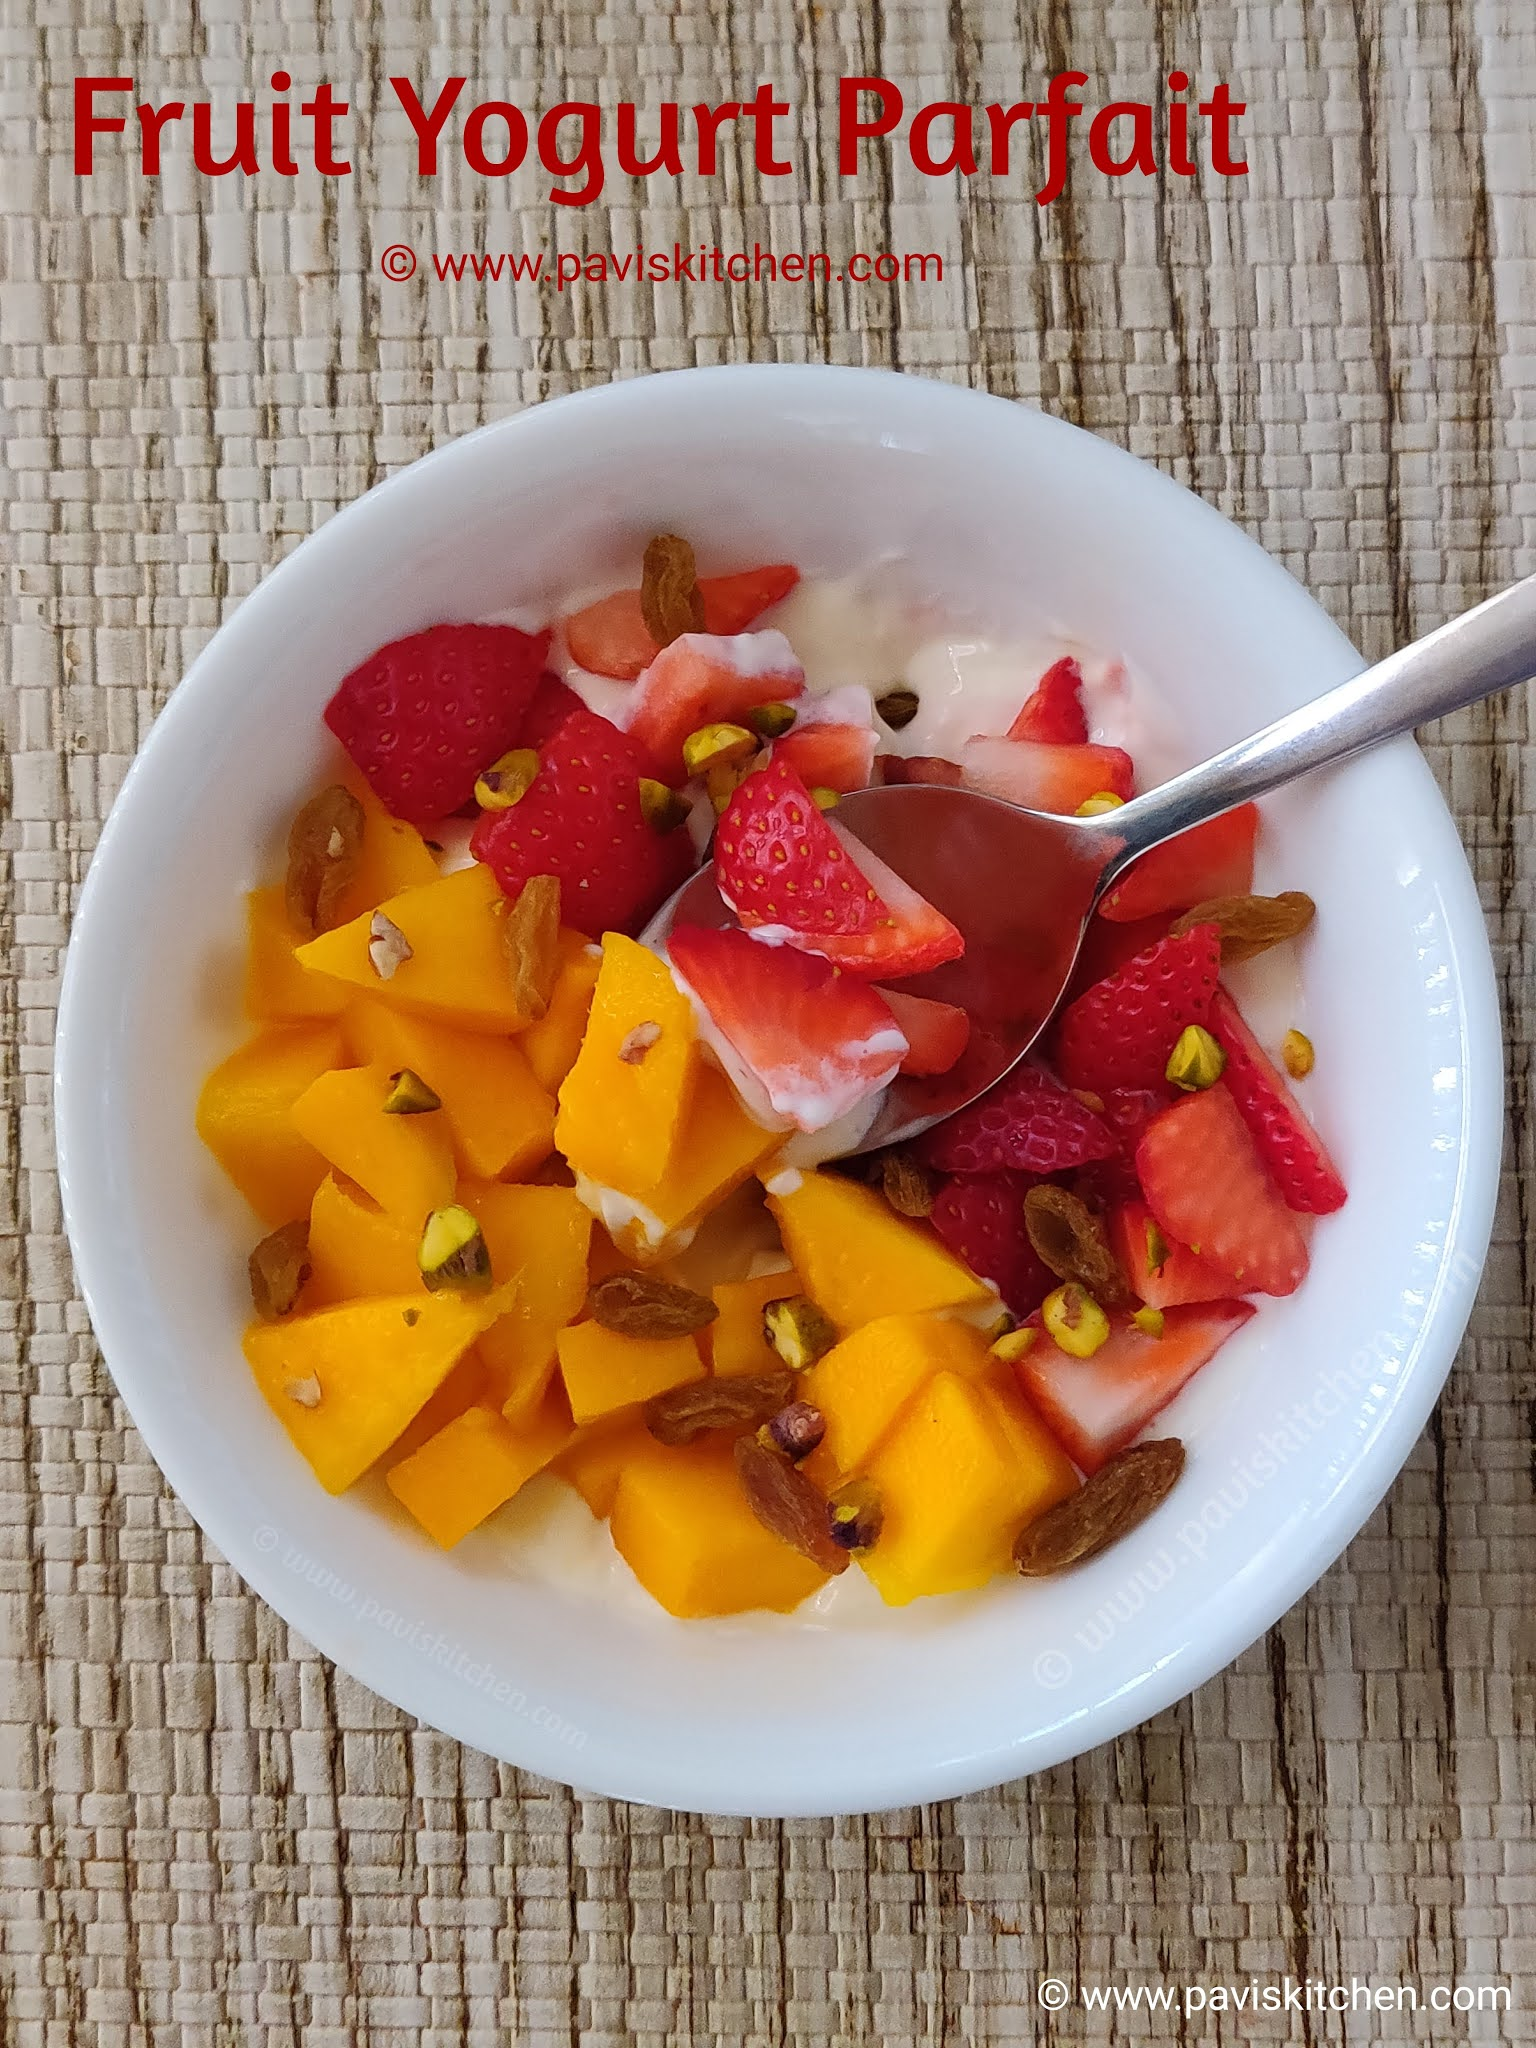 Fruit and yogurt parfait | Indian yogurt parfait | healthy parfait recipe